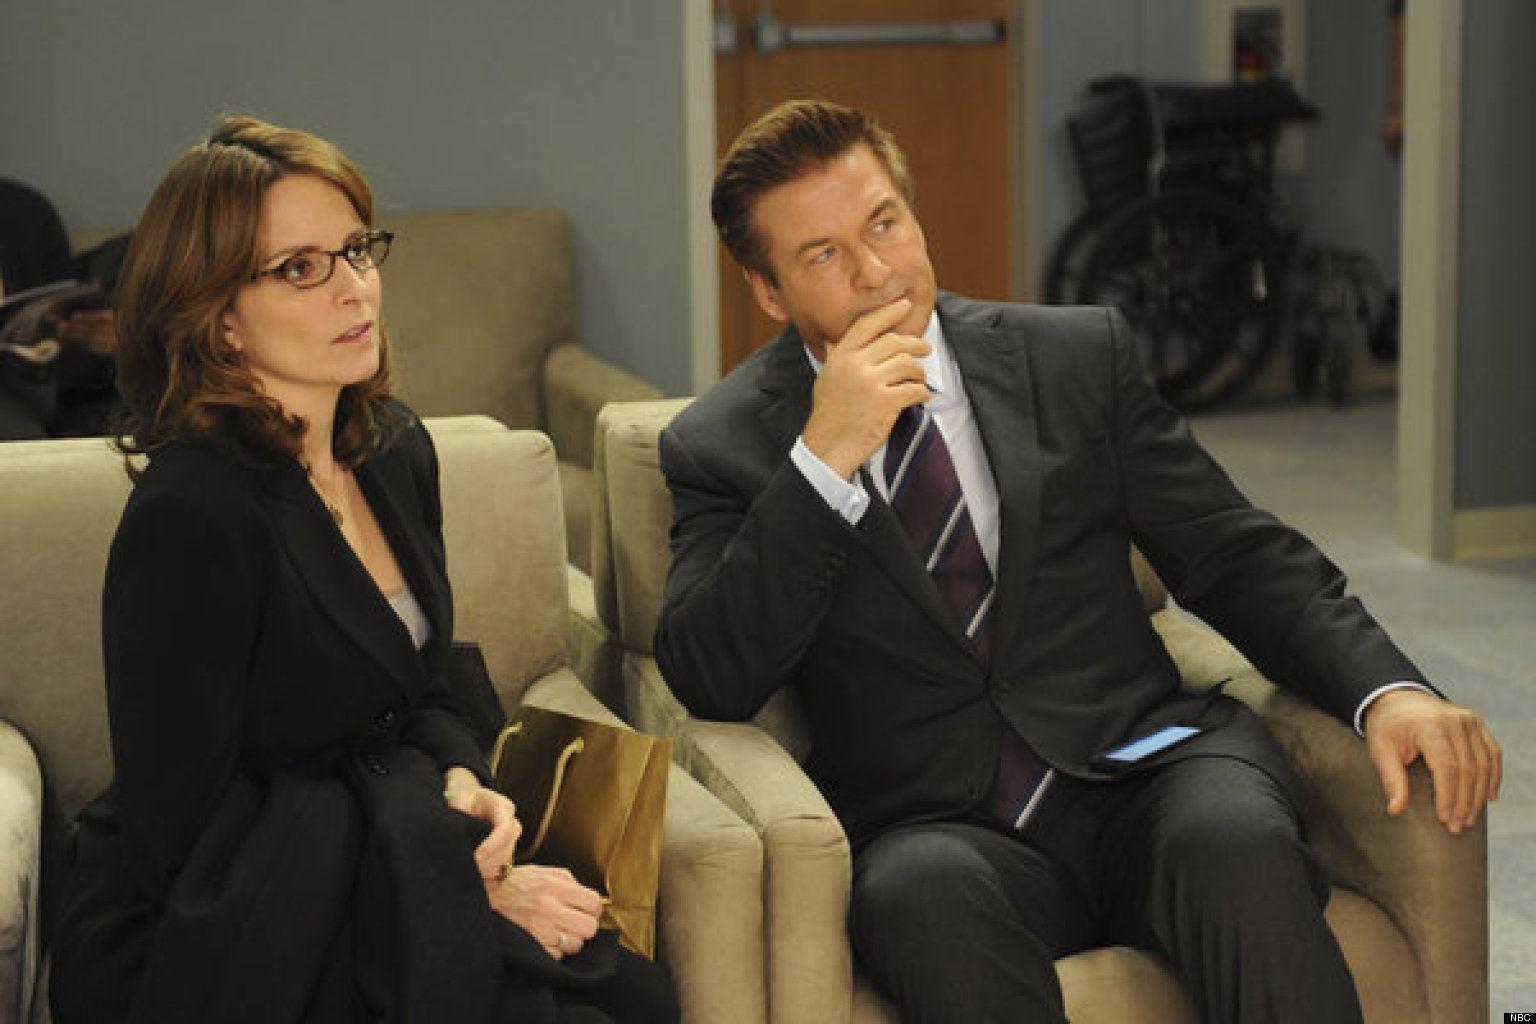 Alec Baldwin sits next to Tina Fey on 30 Rock